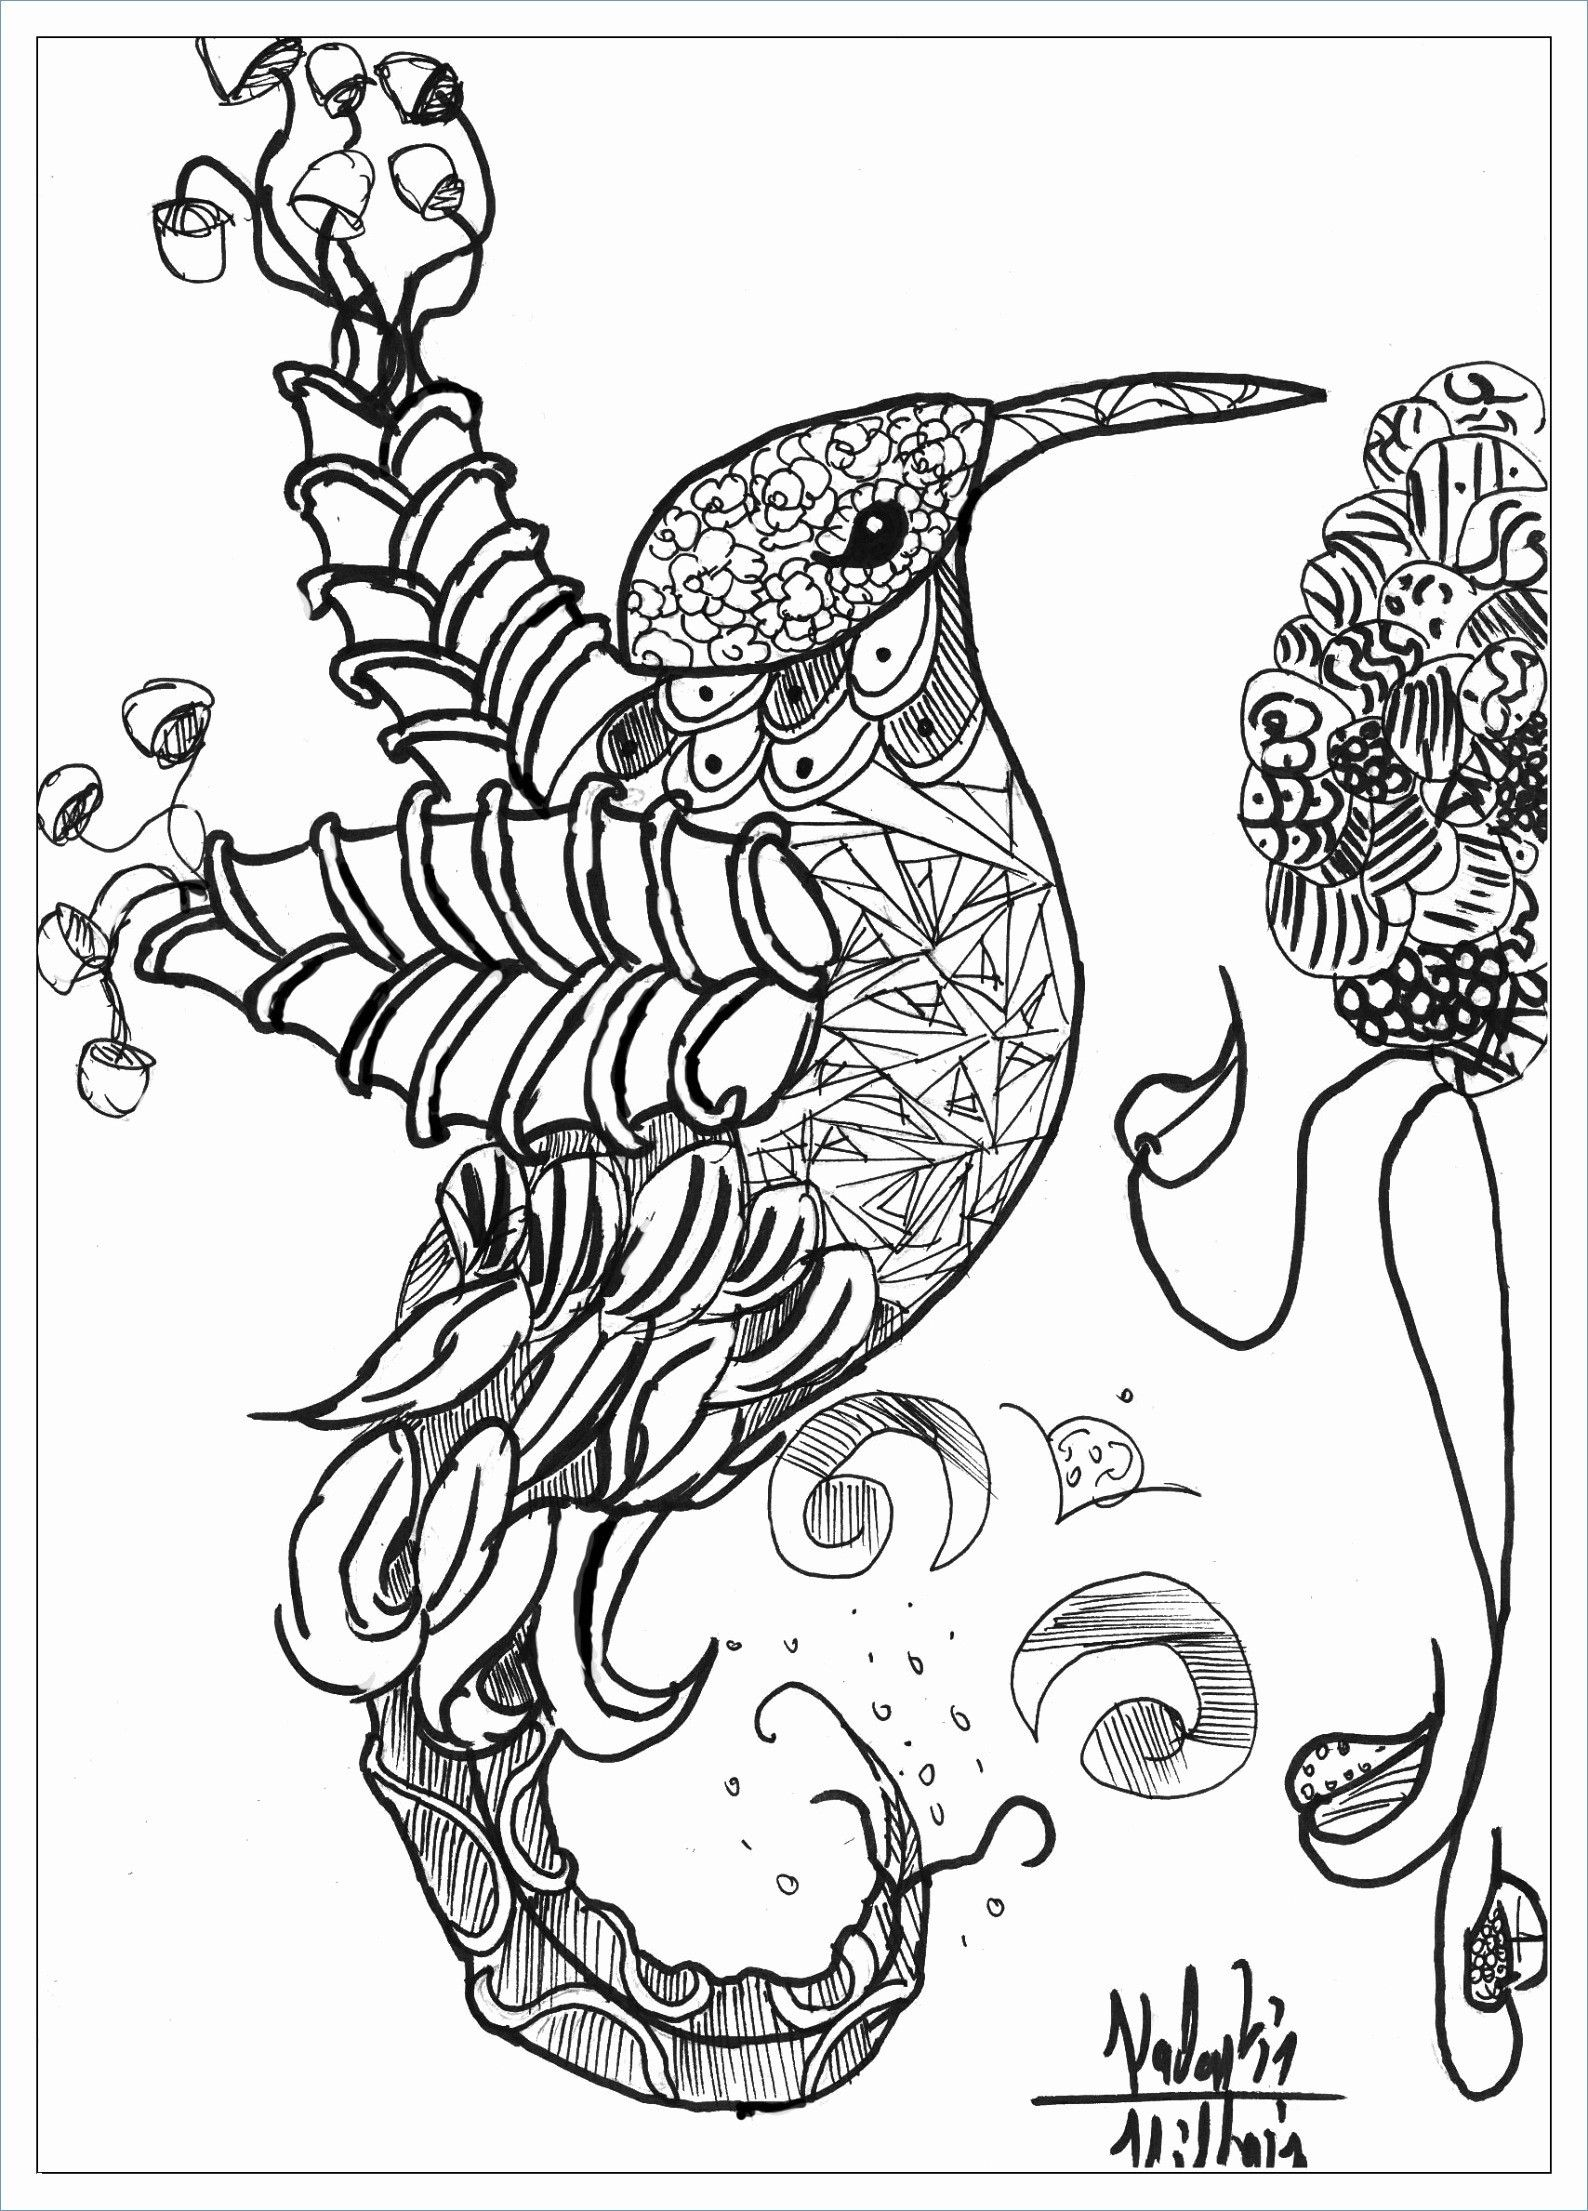 Unique Zentangle Animaux Zentangle Animaux Unique Zentangle Animaux Zentangle Animals Col Bird Coloring Pages Mandala Coloring Pages Animal Coloring Books [ jpg ]